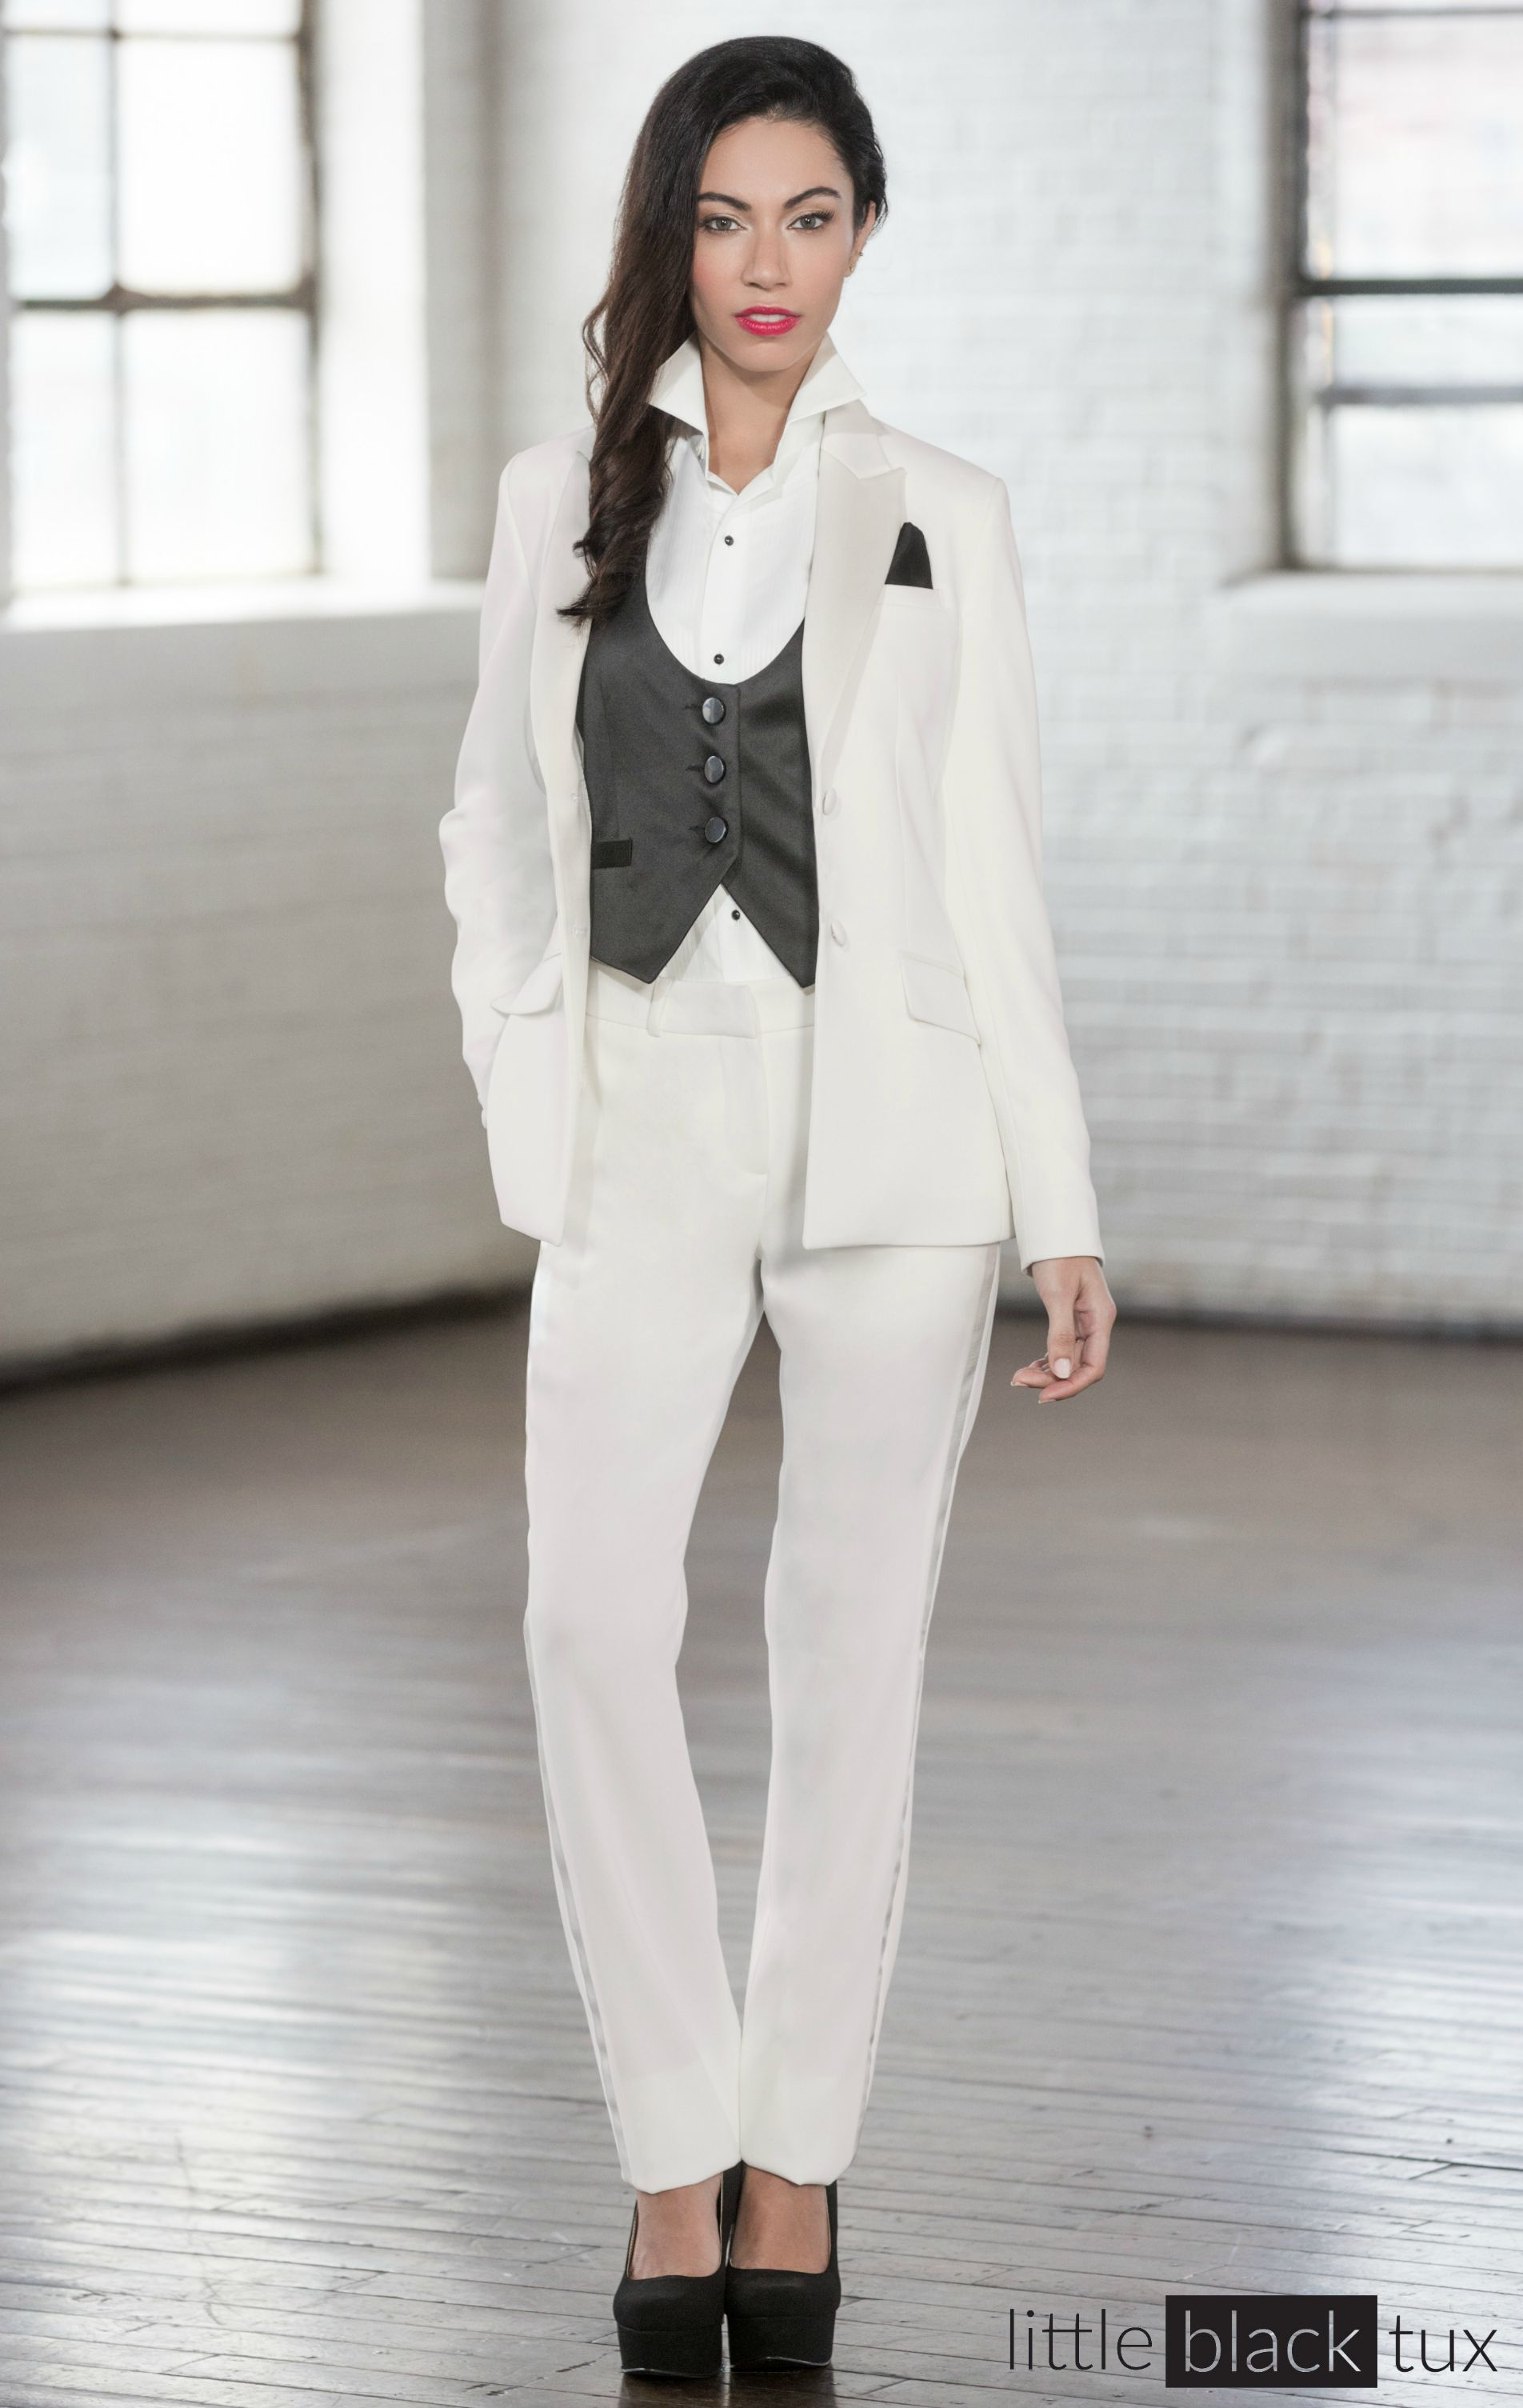 Women\'s Ivory Diamond White Tuxedo / Ladytux. Peak lapel, slim fit ...